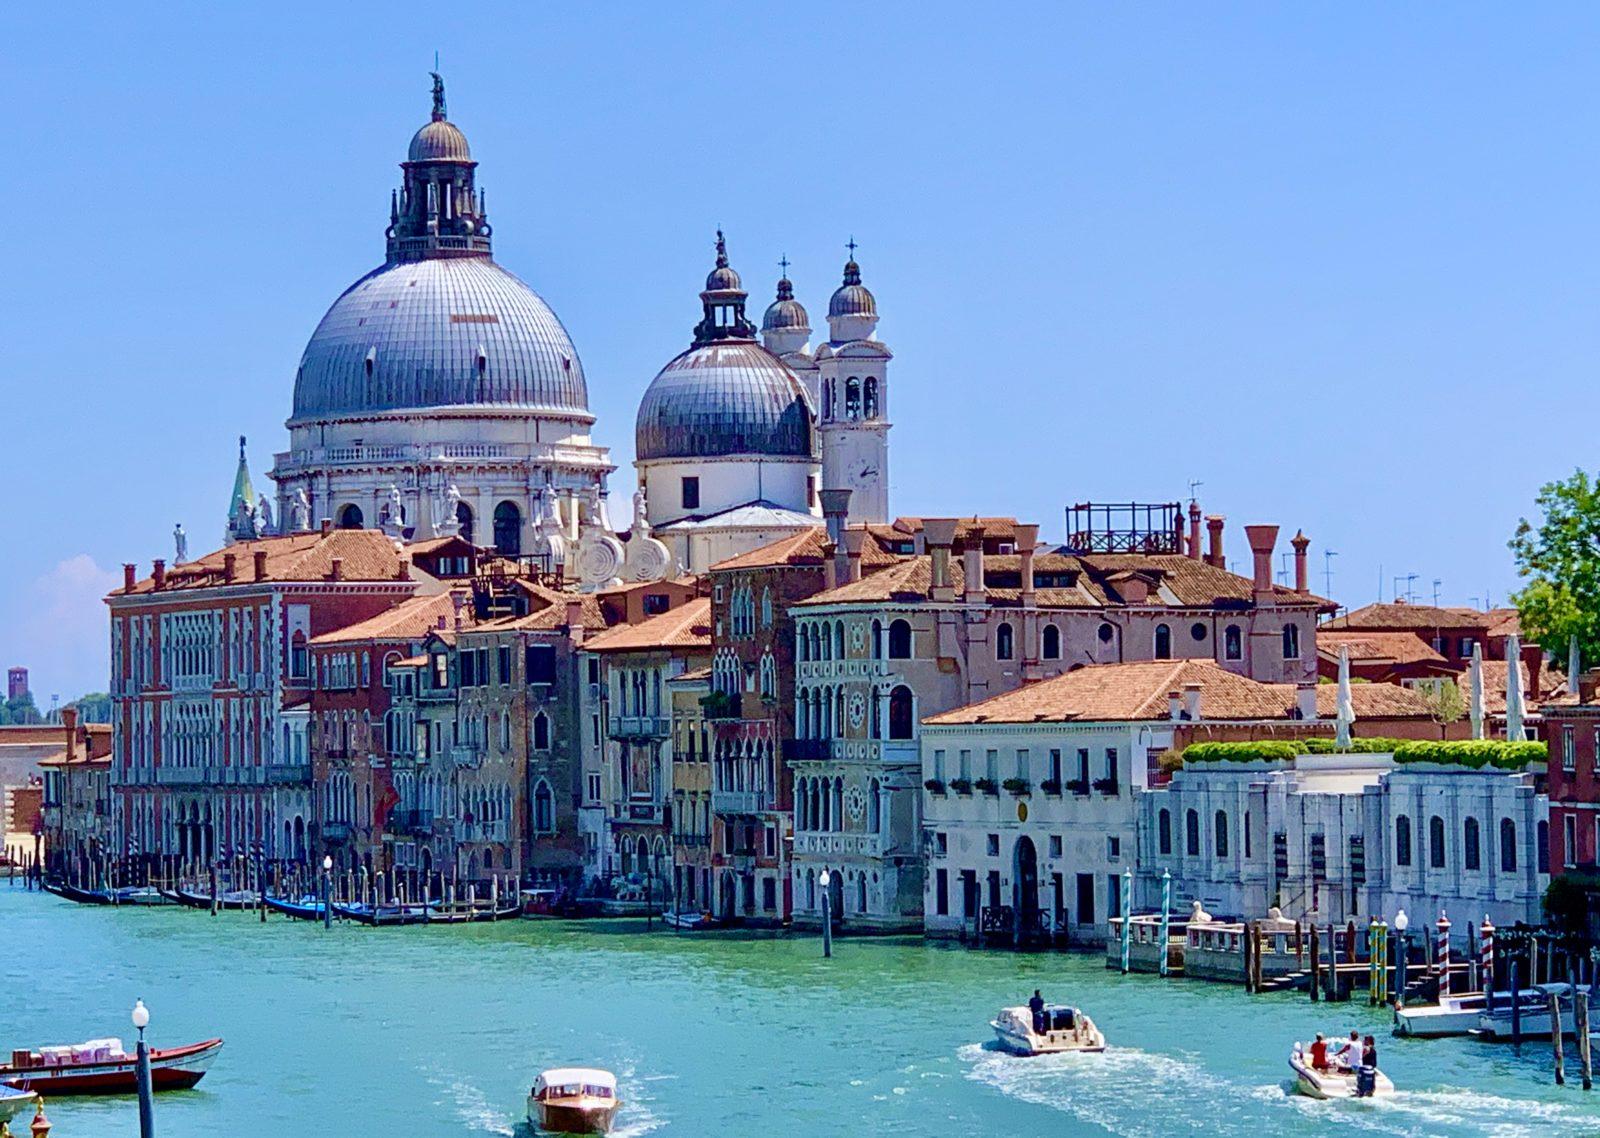 Benátky – Verona – Lago di Garda – Sirmione